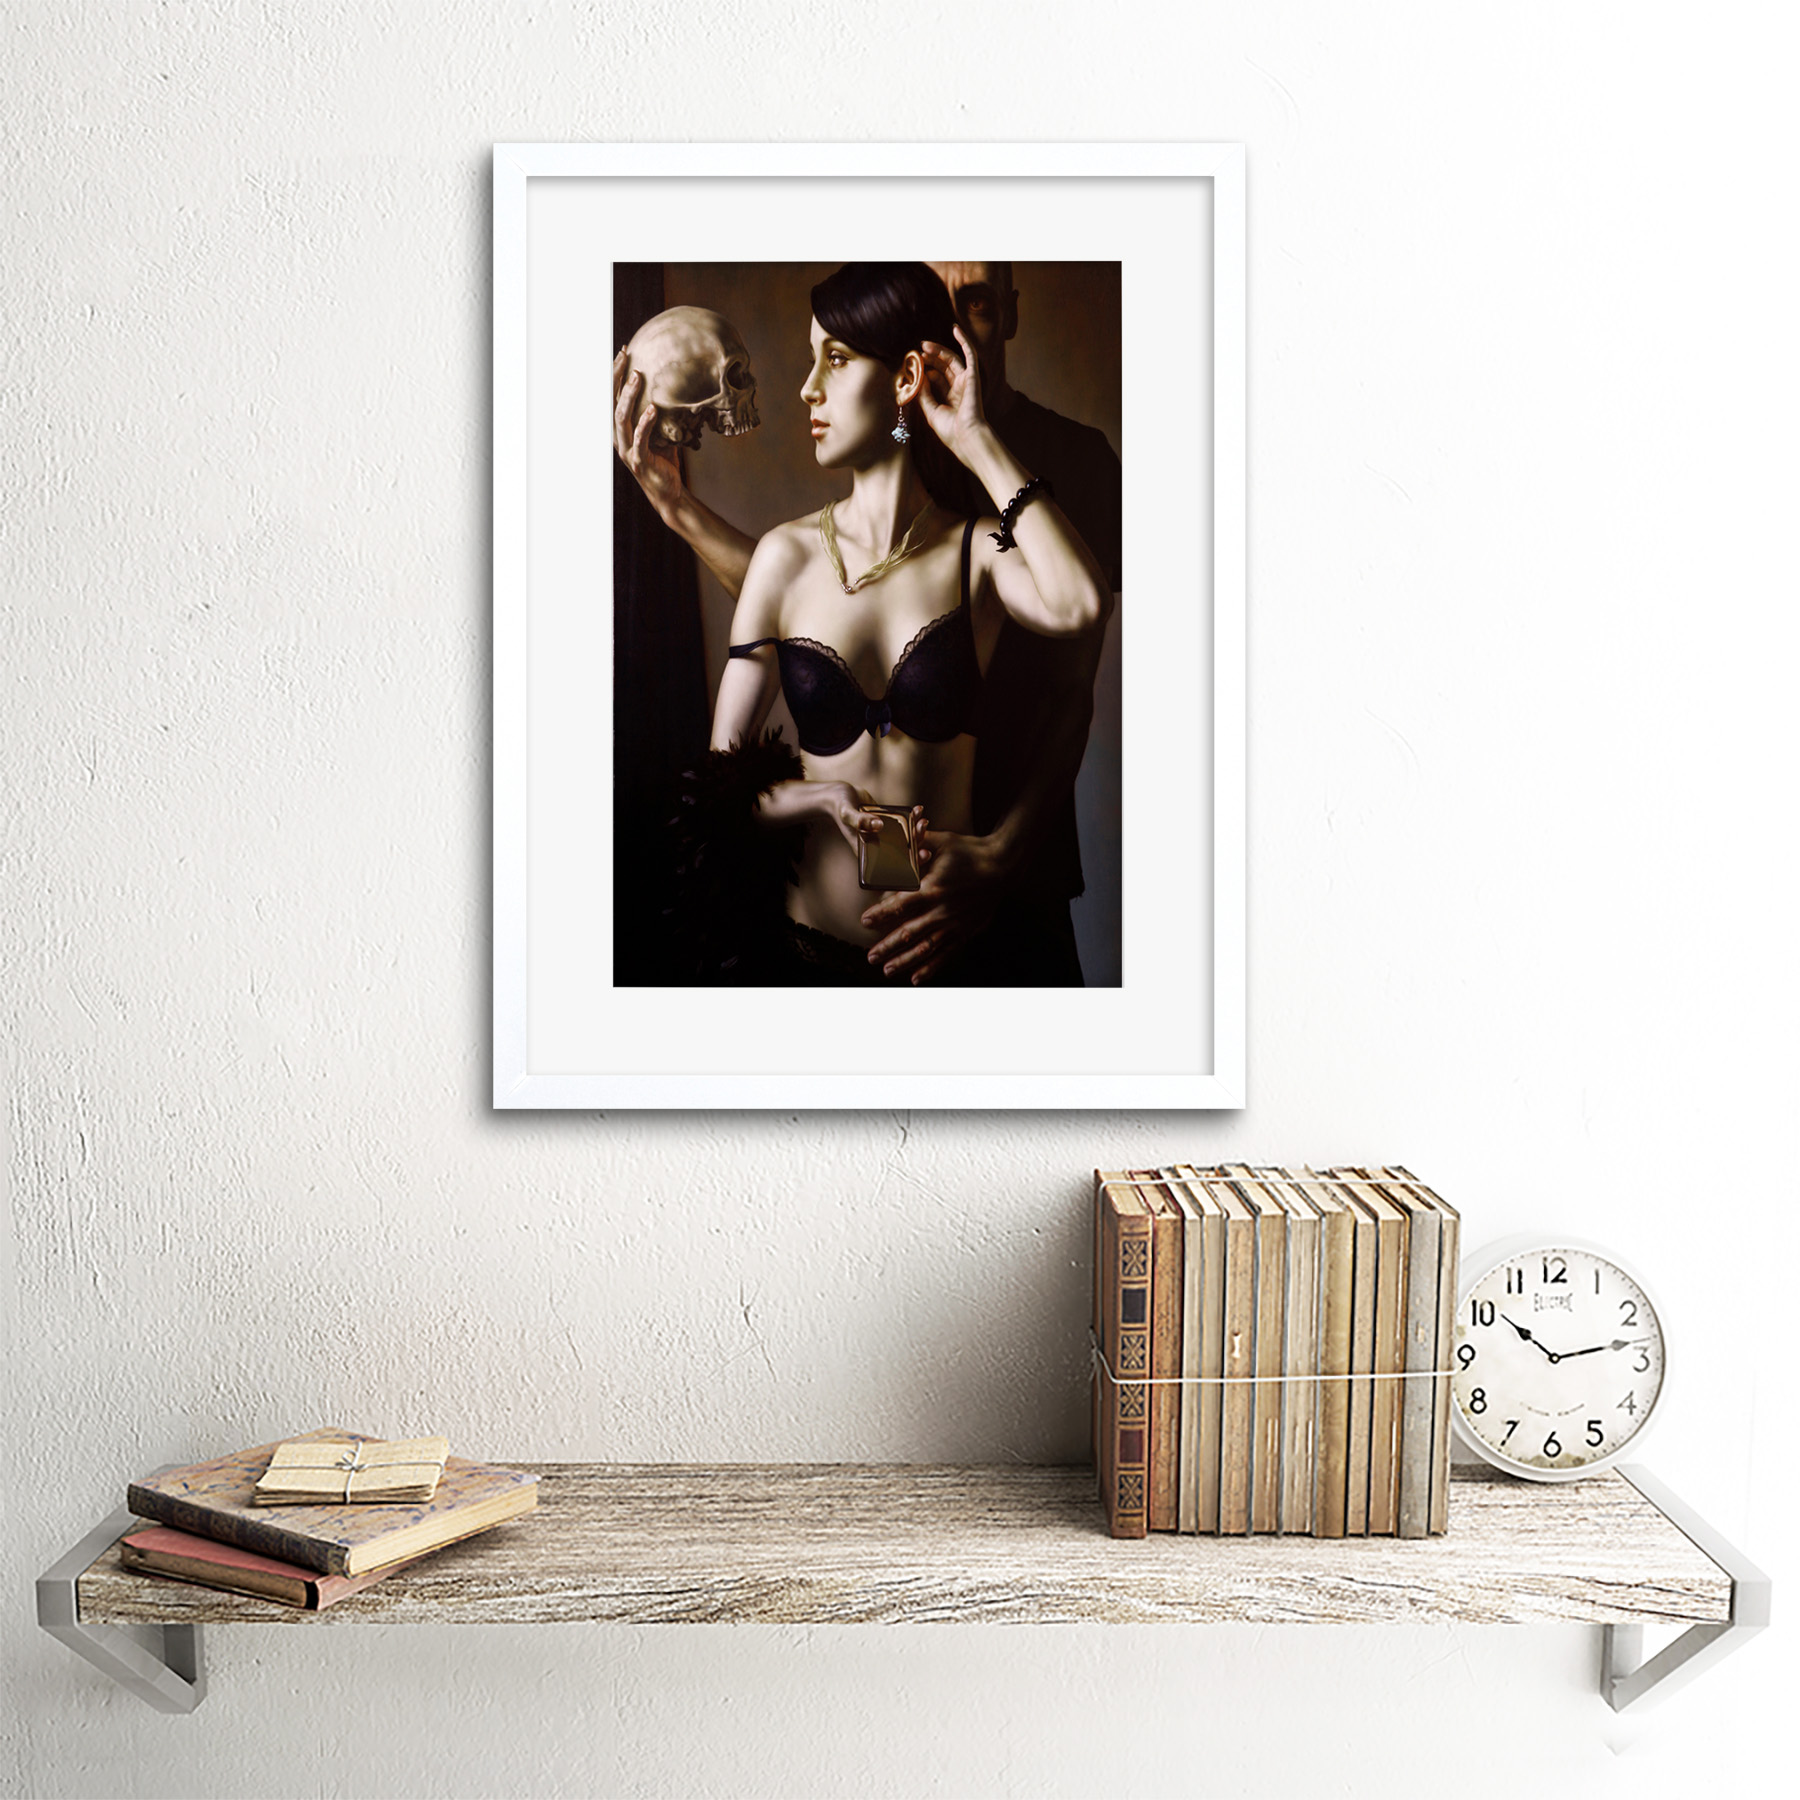 Painting-Balcar-Send-Me-To-The-Future-Framed-Art-Print-12x16-Inch 縮圖 22